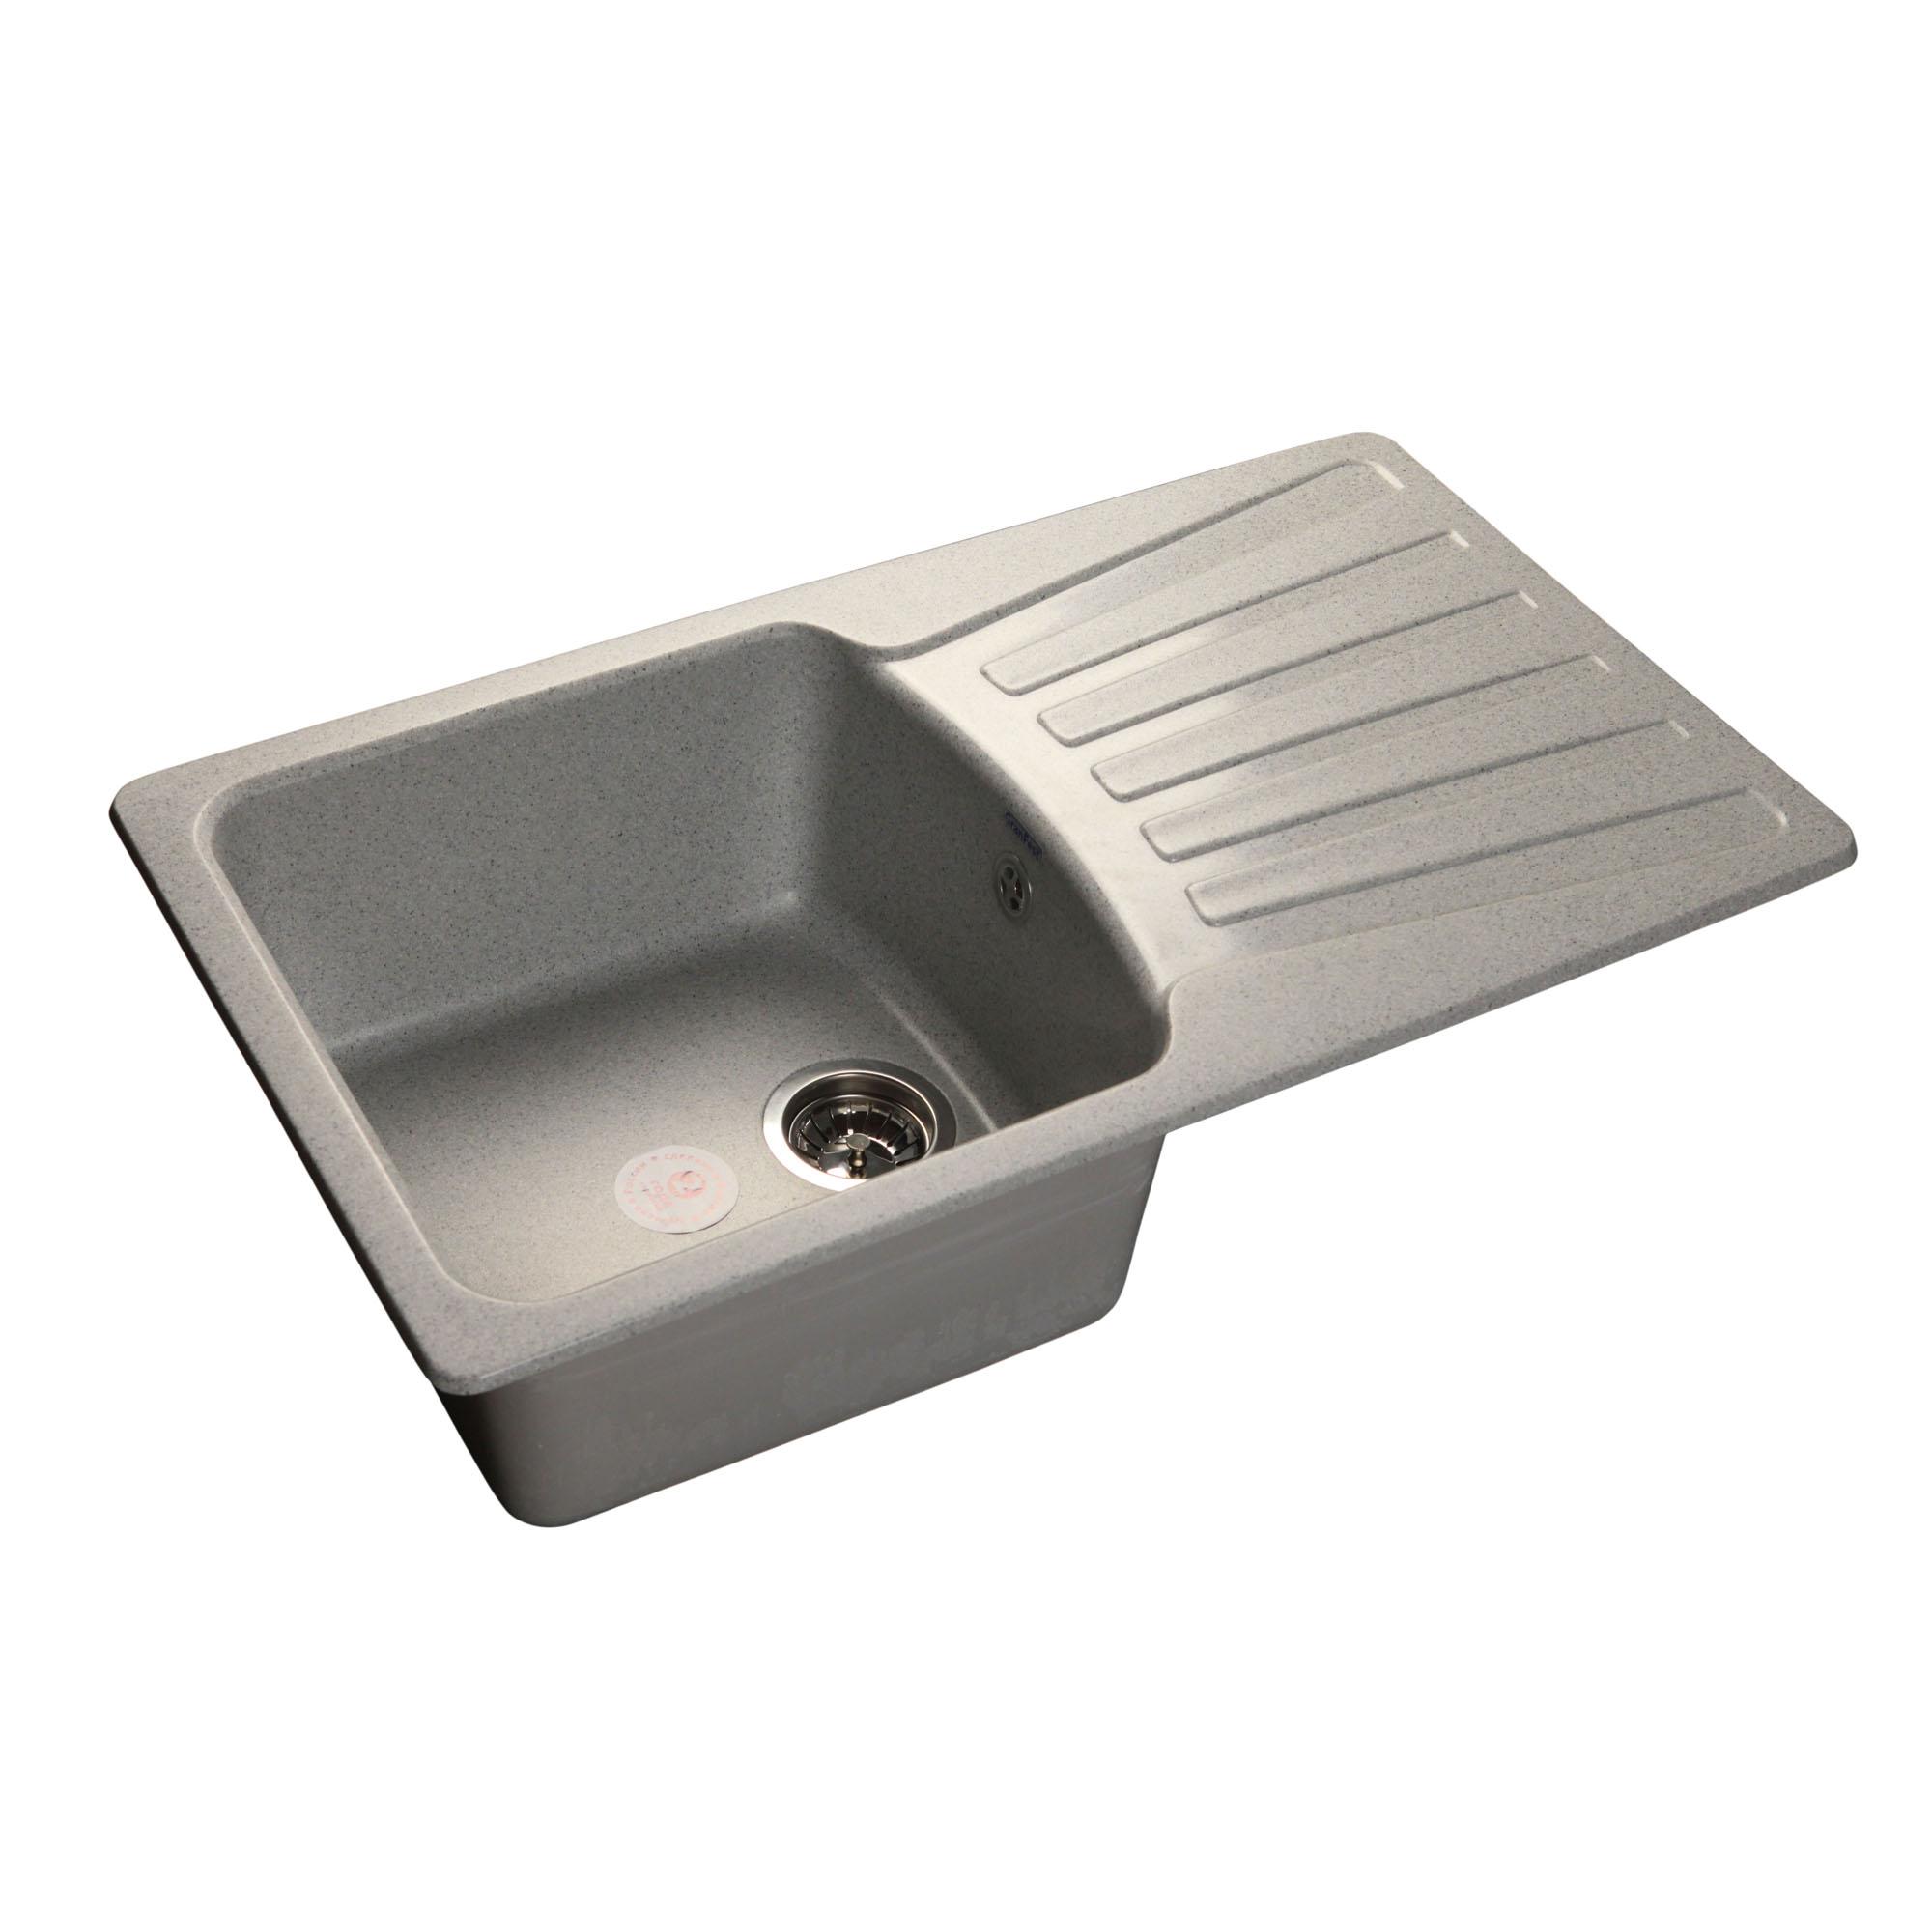 Кухонная мойка GranFest Standart GF-S850L серый мойка кухонная granfest гранит 850x495 gf s850l терракот